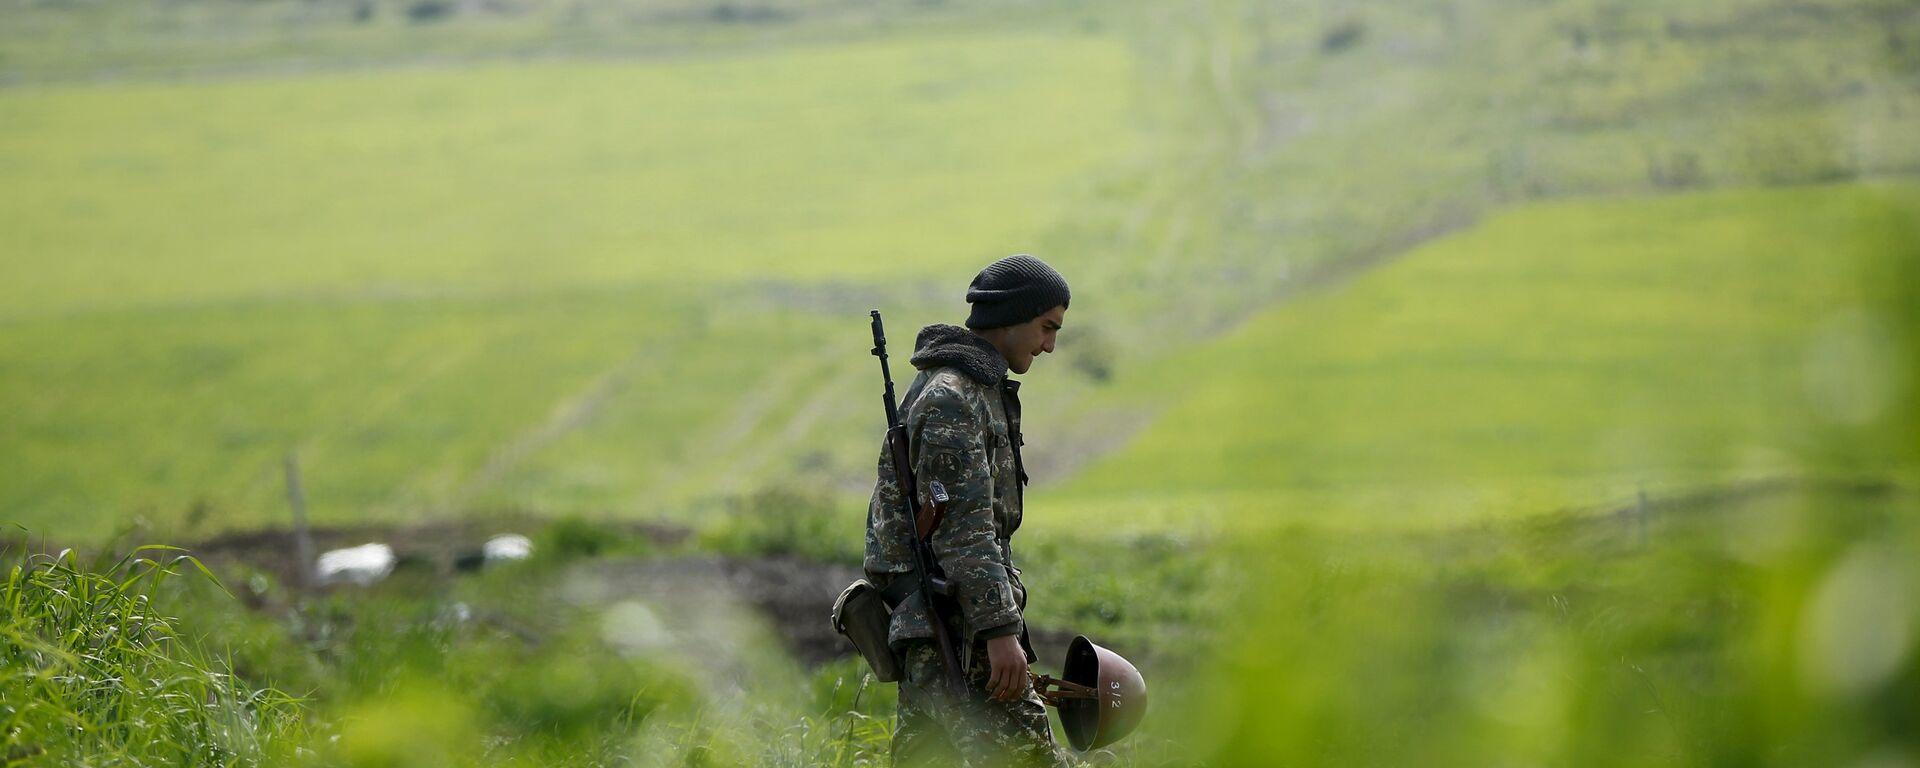 Militar en Nagorno Karabaj - Sputnik Mundo, 1920, 02.06.2021